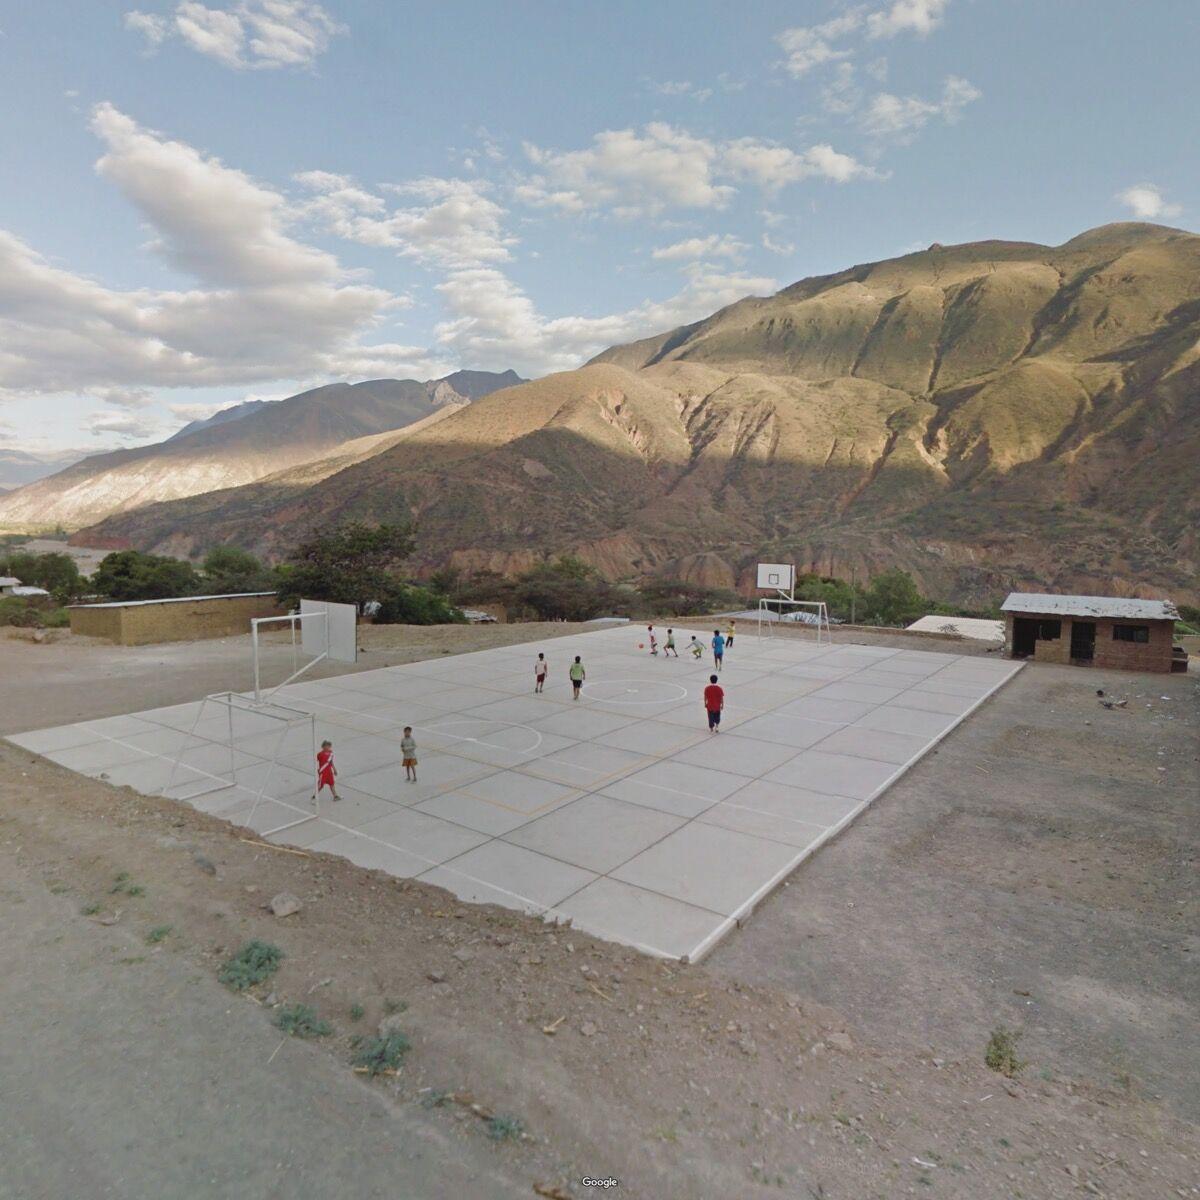 Cajamarca, Peru. Photograph by Jacqui Kenny via Google Street View.